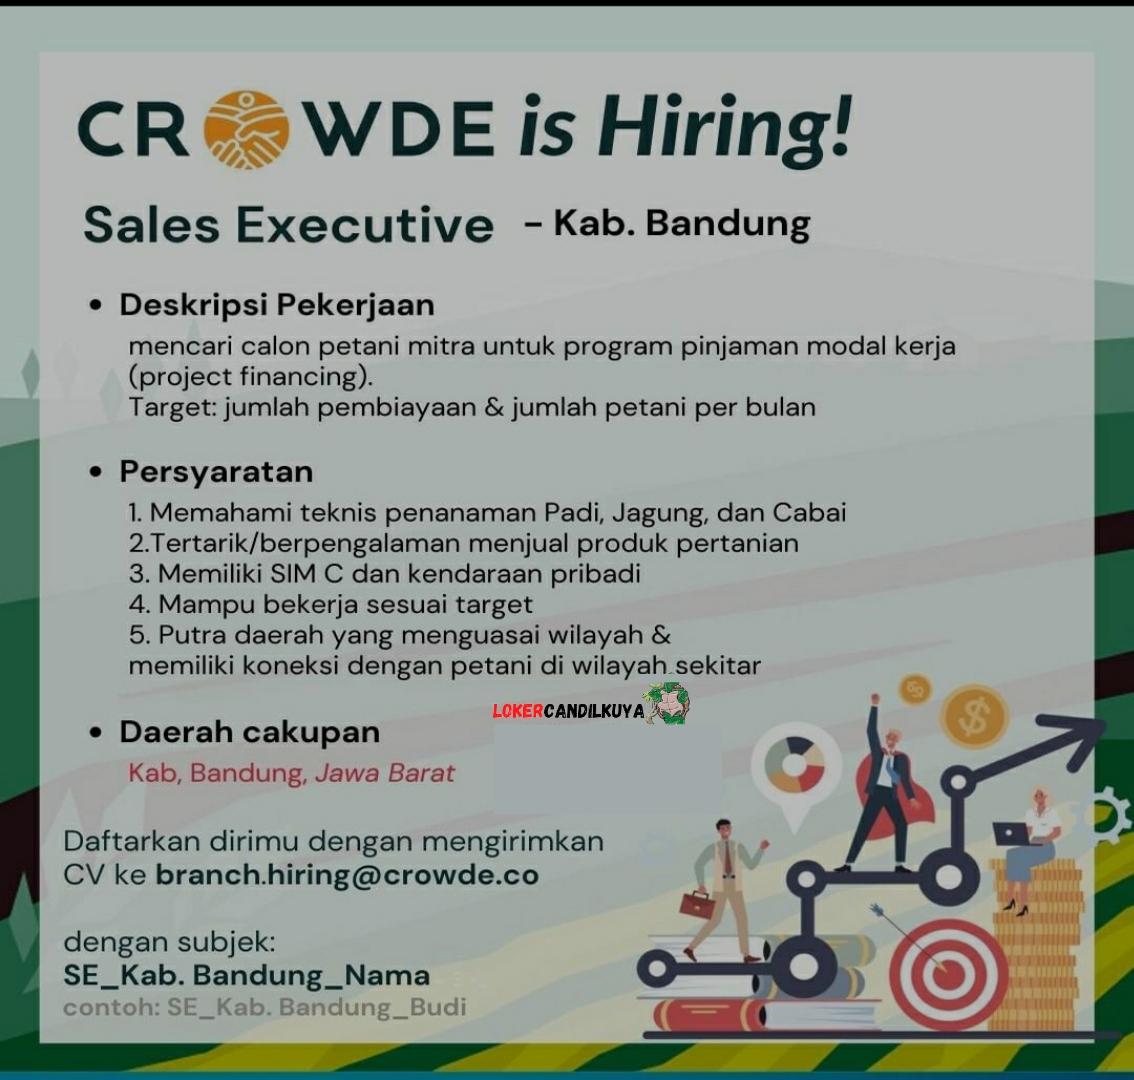 Lowongan Kerja Sales Executive Crowde Bandung